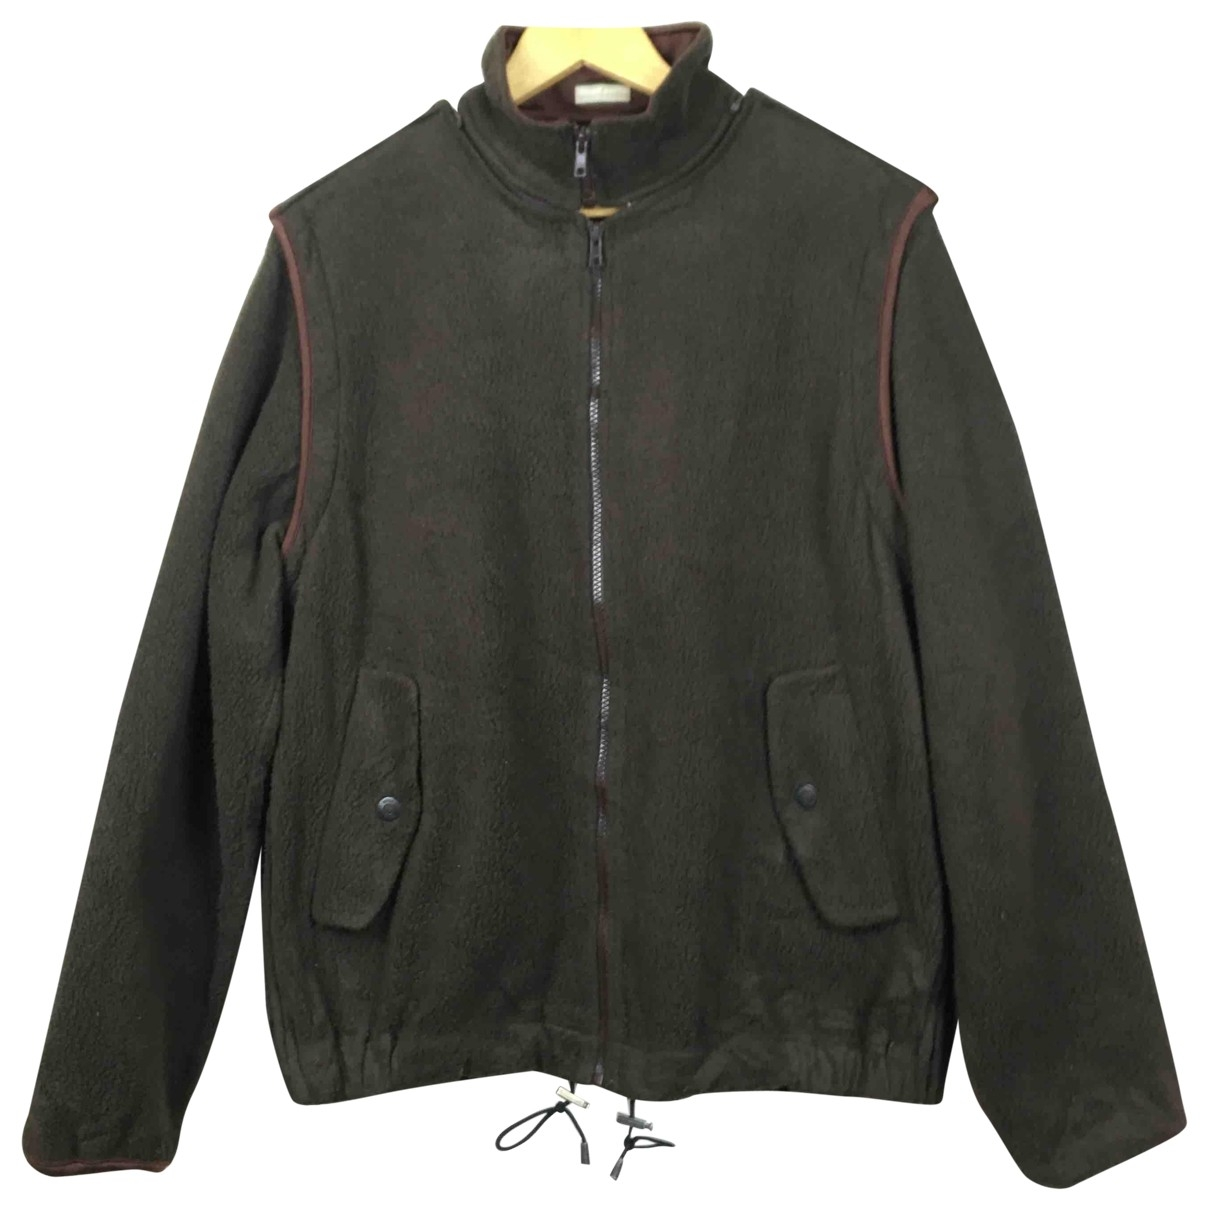 Undercover \N Brown jacket  for Men M International